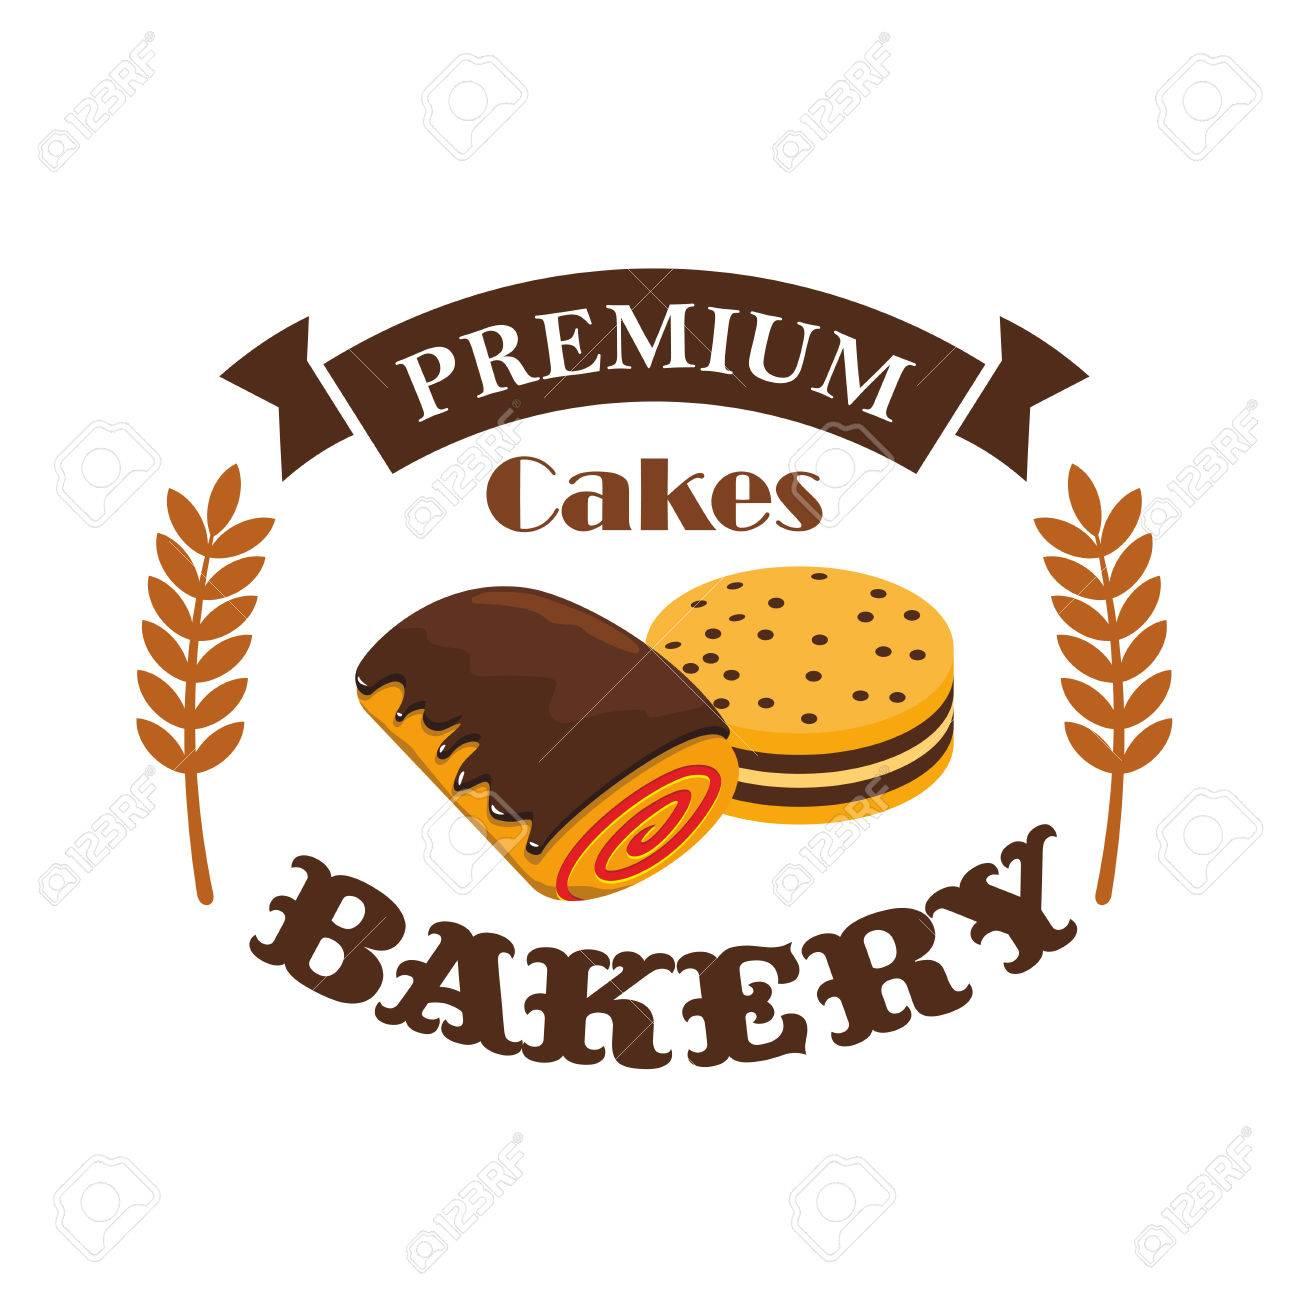 Bakery, Pastry Shop Emblem, Vector Patisserie Business Label ...